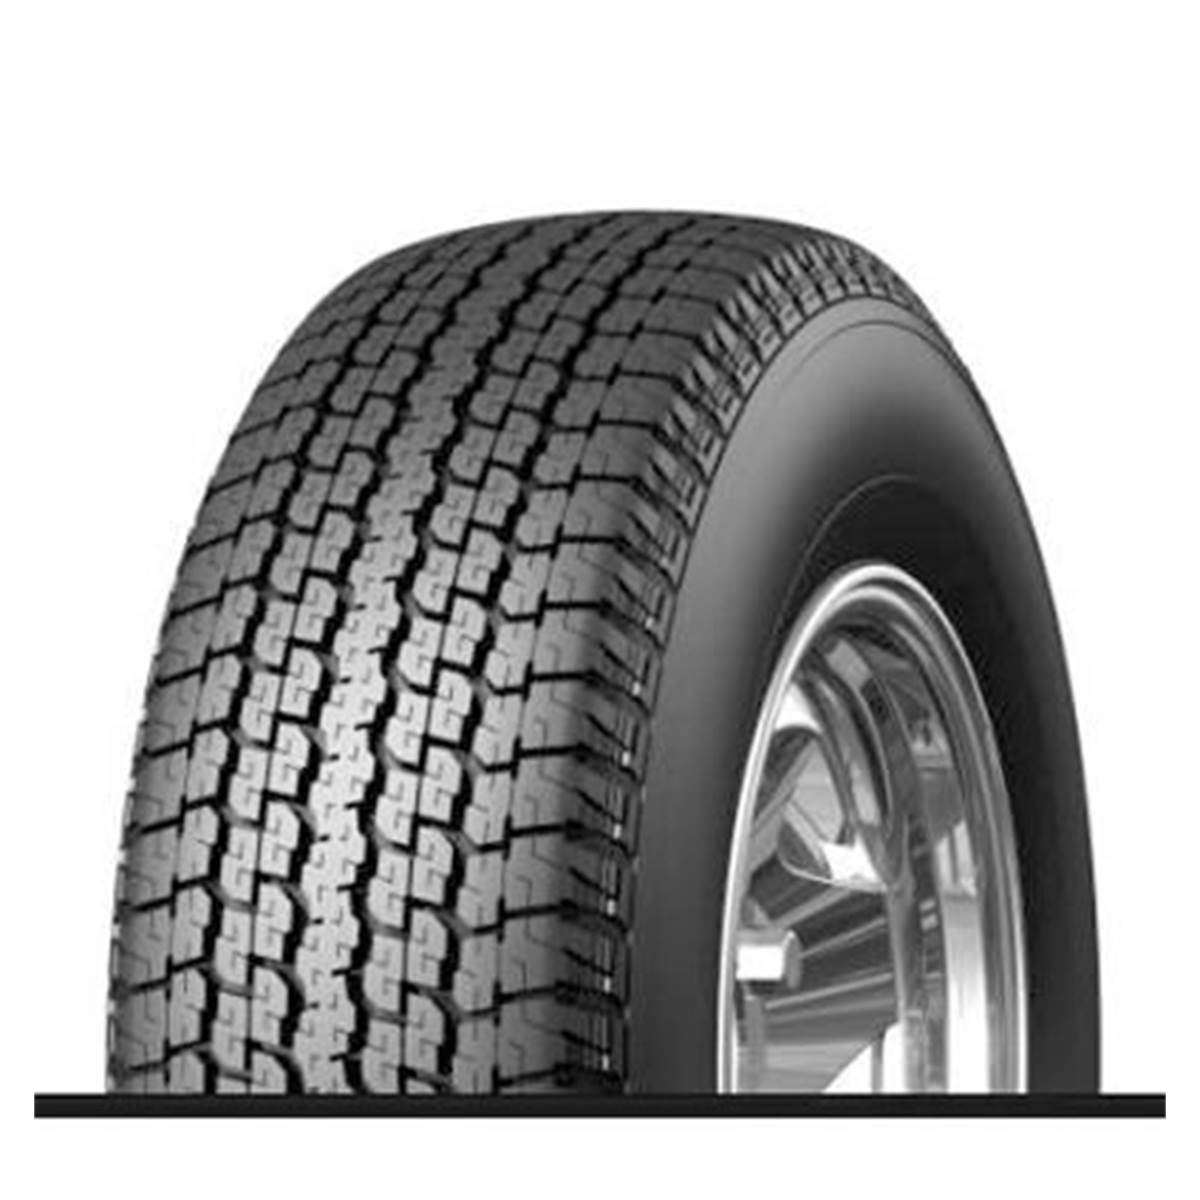 Pneu Bridgestone 255/70R18 113S DUELER D840